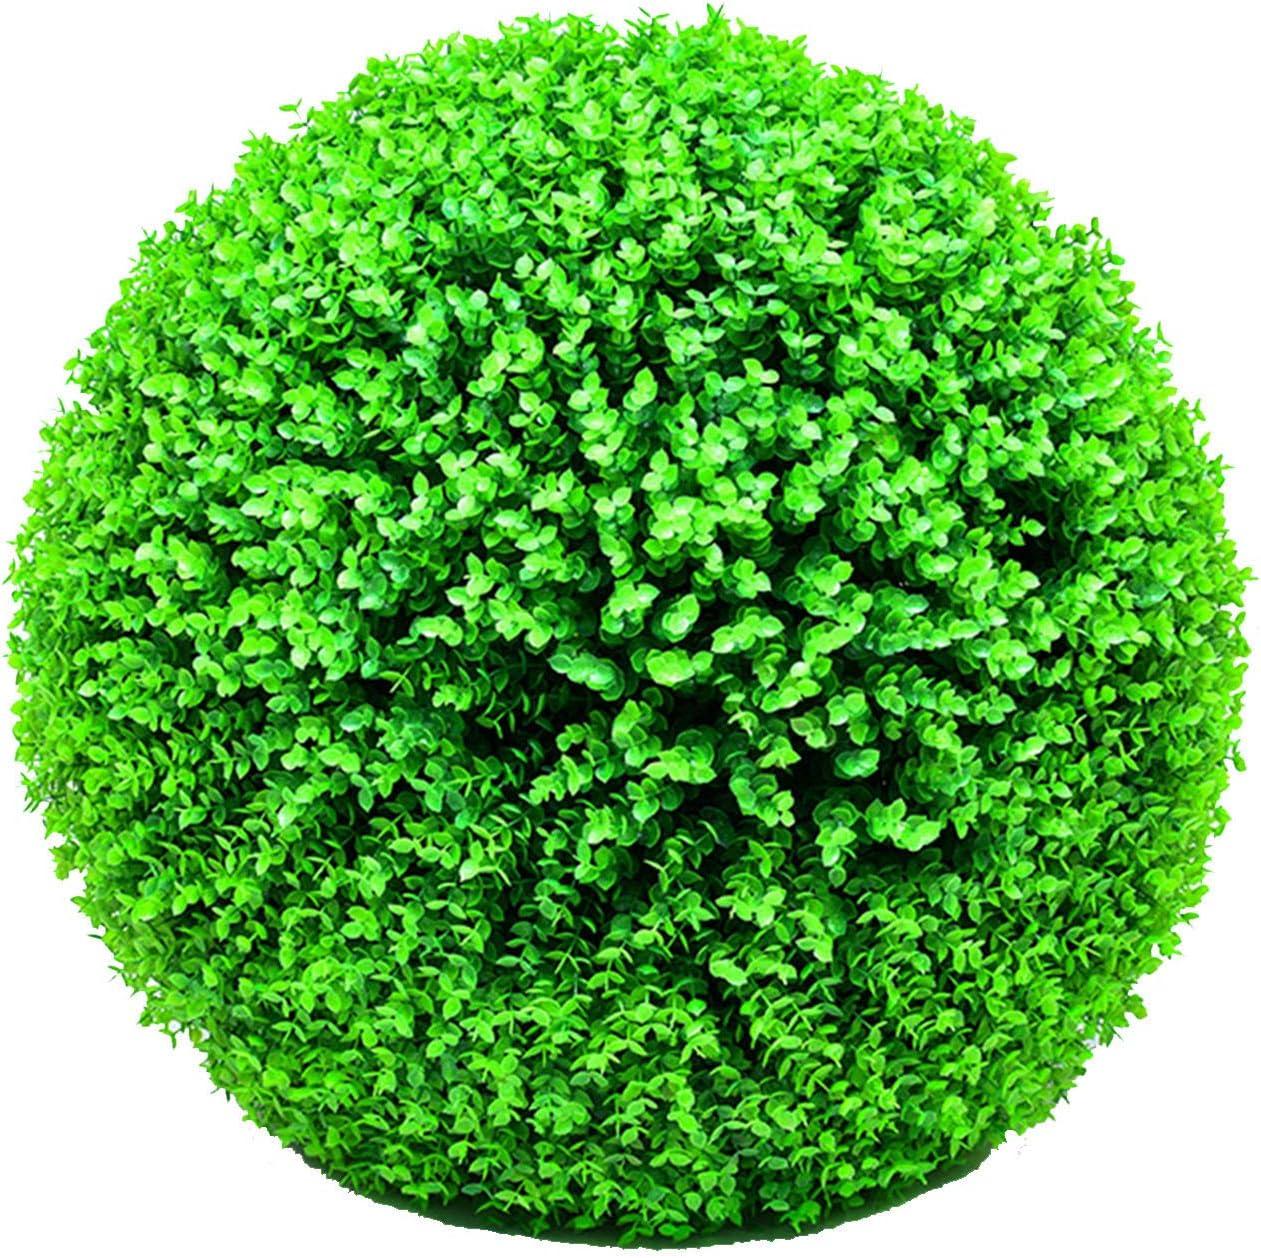 LAHappy Artificial Latest Manufacturer OFFicial shop item Topiary Balls Plant Gra Plastic